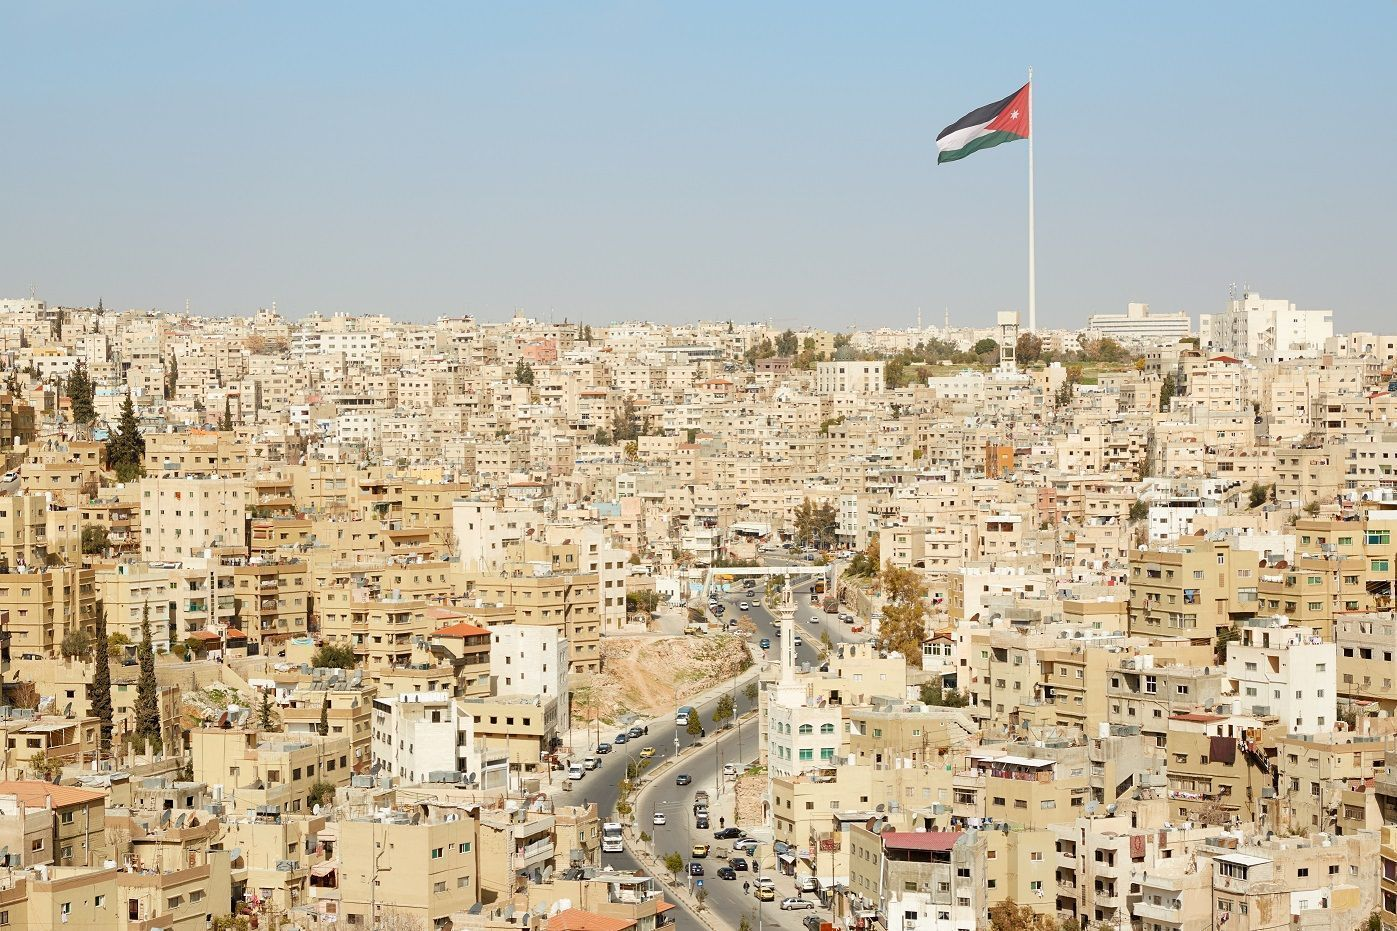 Teach in Amman, Jordan with monthly stipend! #jordan #teach #teachoverseas #teachabroad #ammanjordan Teach in Amman, Jordan with monthly stipend! #jordan #teach #teachoverseas #teachabroad #ammanjordan Teach in Amman, Jordan with monthly stipend! #jordan #teach #teachoverseas #teachabroad #ammanjordan Teach in Amman, Jordan with monthly stipend! #jordan #teach #teachoverseas #teachabroad #ammanjordan Teach in Amman, Jordan with monthly stipend! #jordan #teach #teachoverseas #teachabroad #ammanjo #ammanjordan